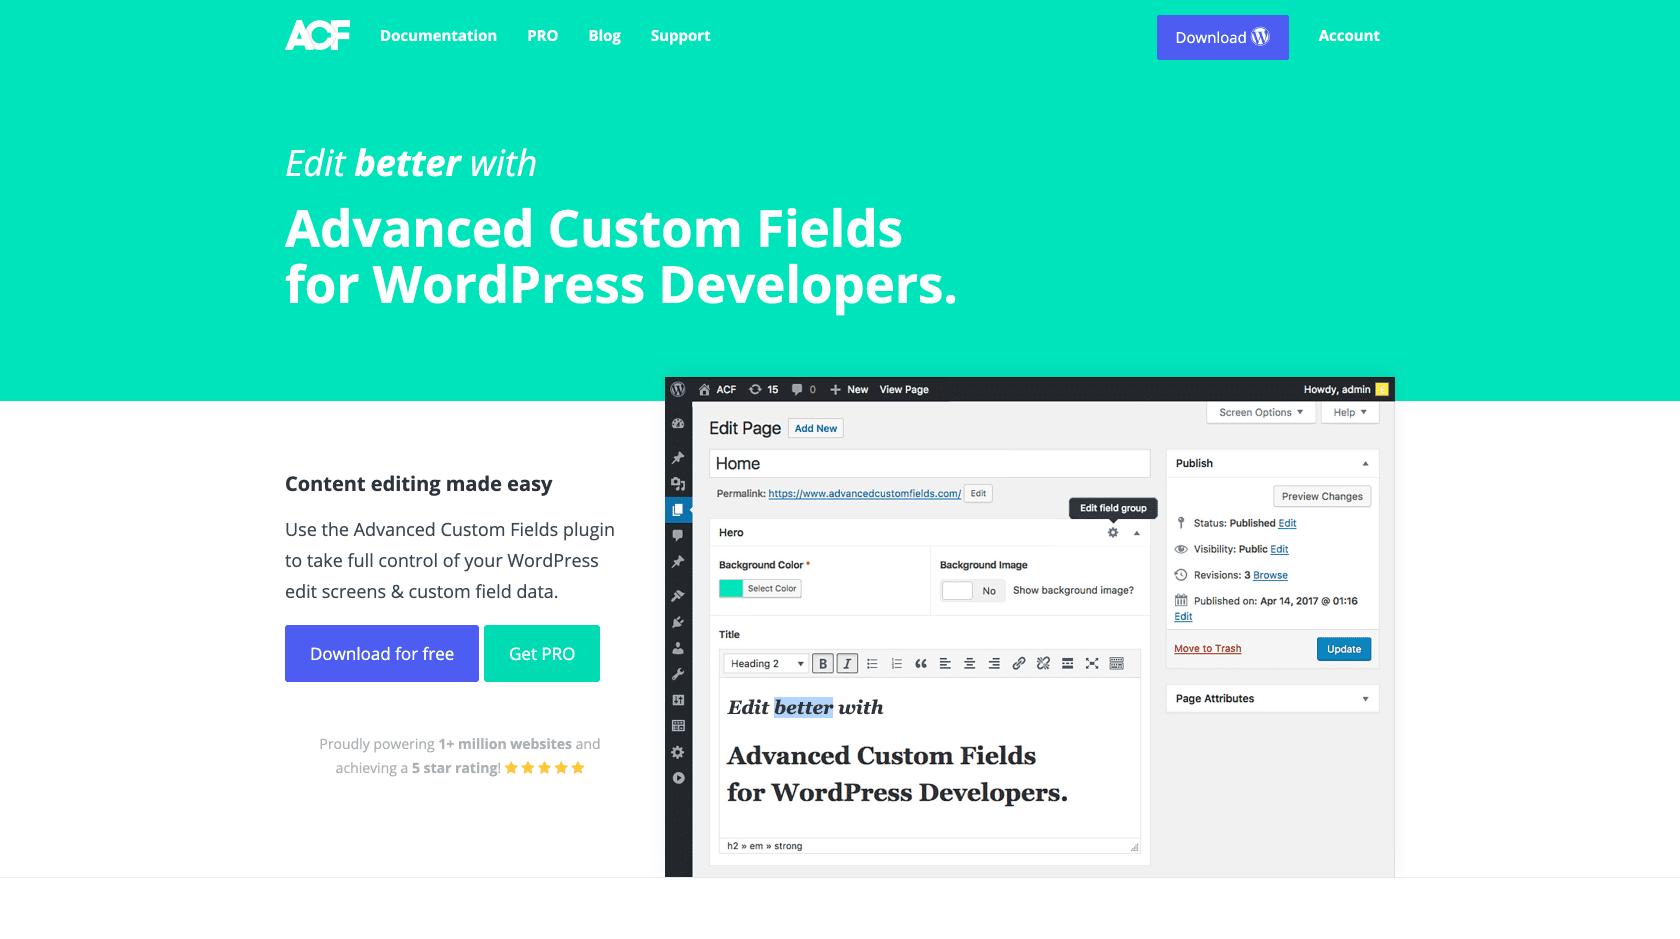 Screen shot of Advanced Custom Fields' home page